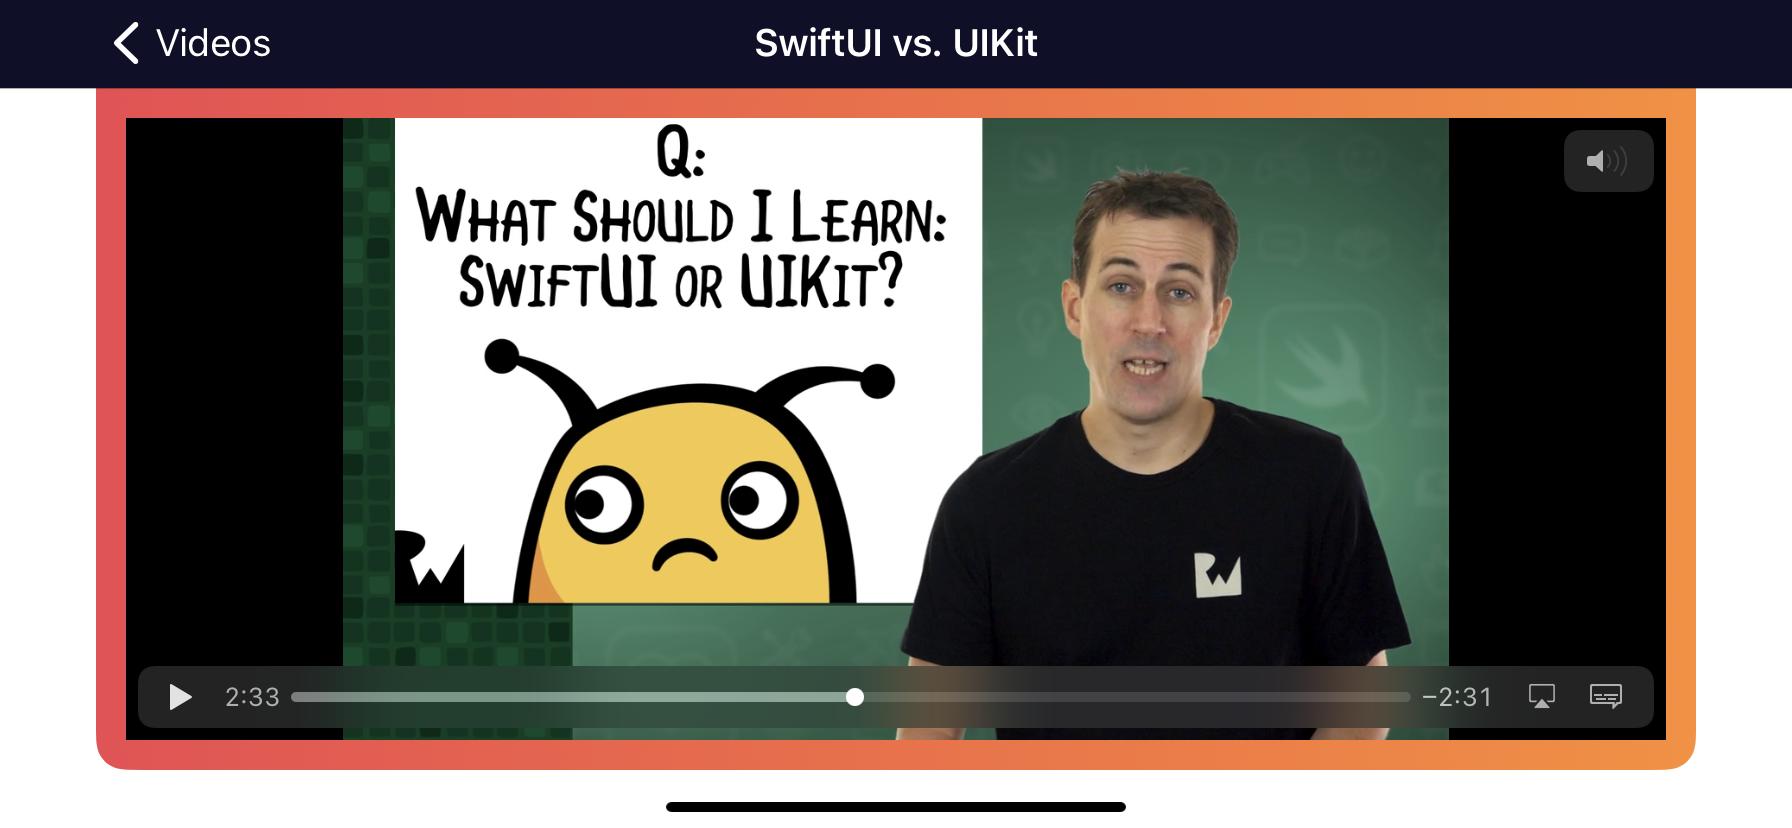 SwiftUI or UIKit?